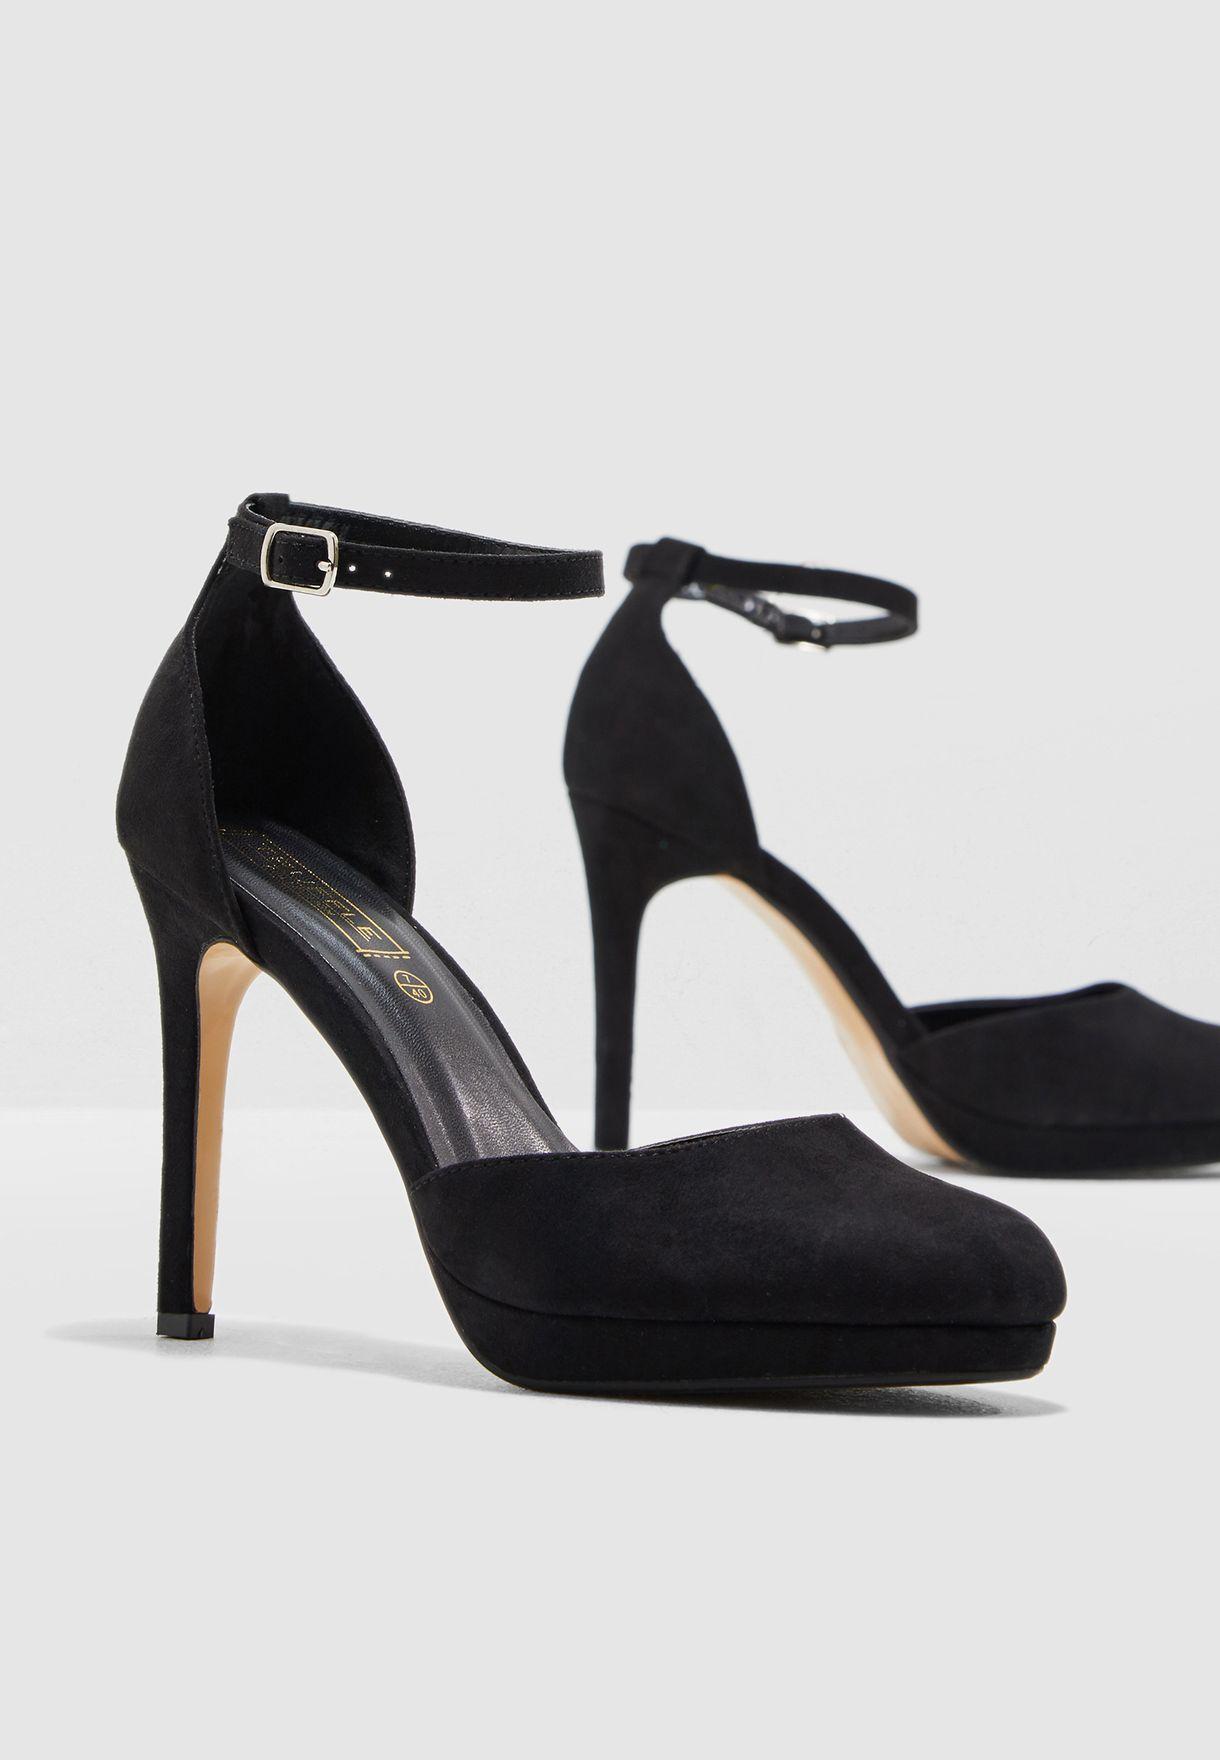 1f8f5987dd0 Black Platform Court Shoes With Ankle Strap - Style Guru  Fashion ...